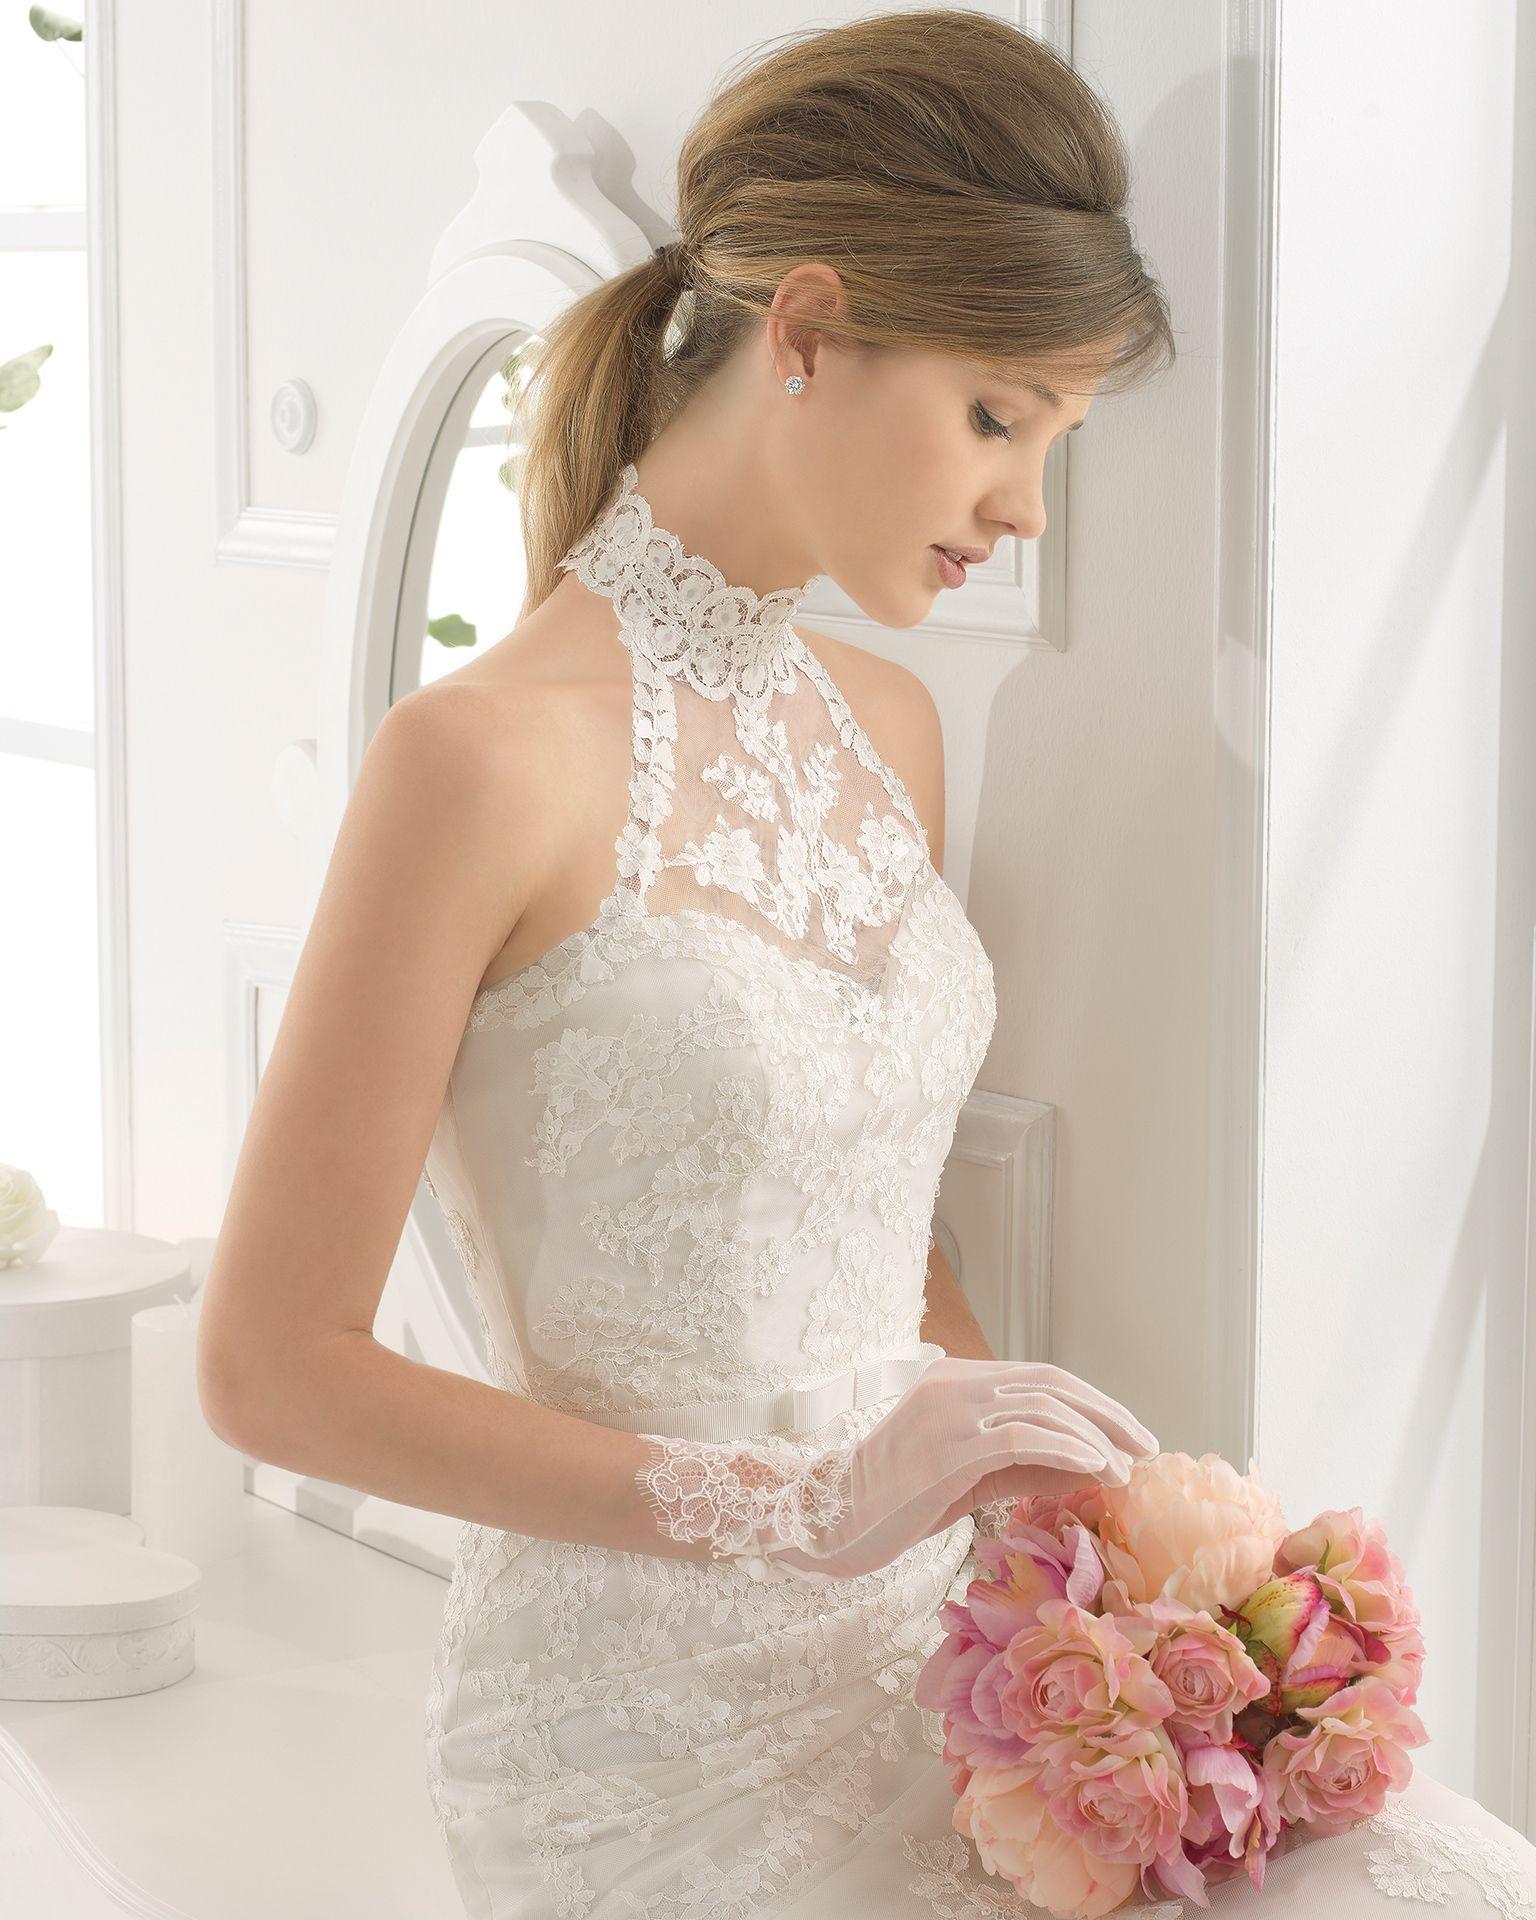 Altar vestido de novia corte sirena | casorio Geri | Pinterest ...